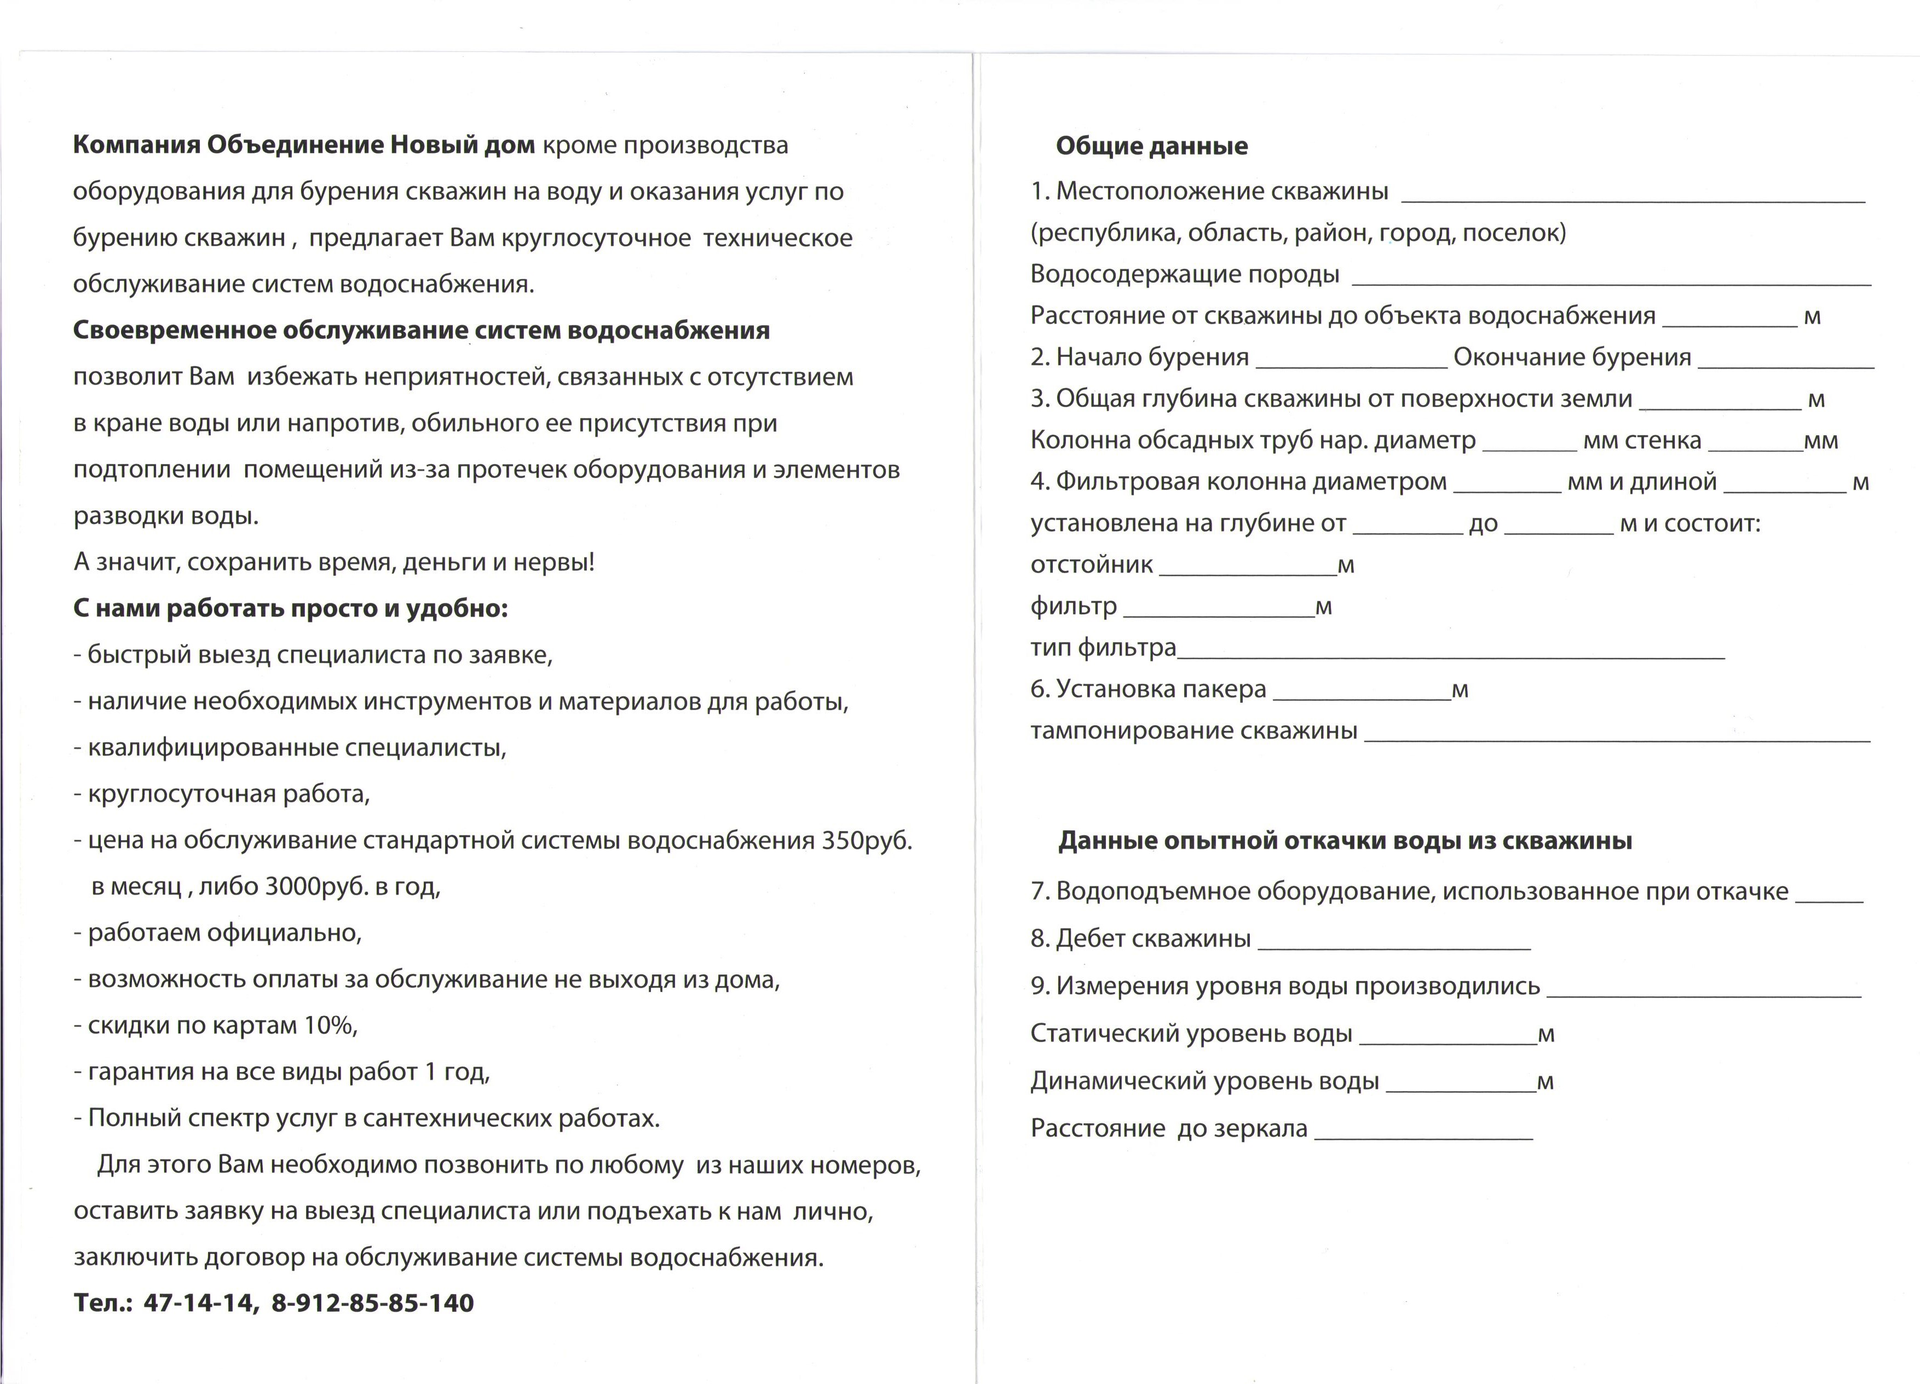 папорт на скважину описание характеристик